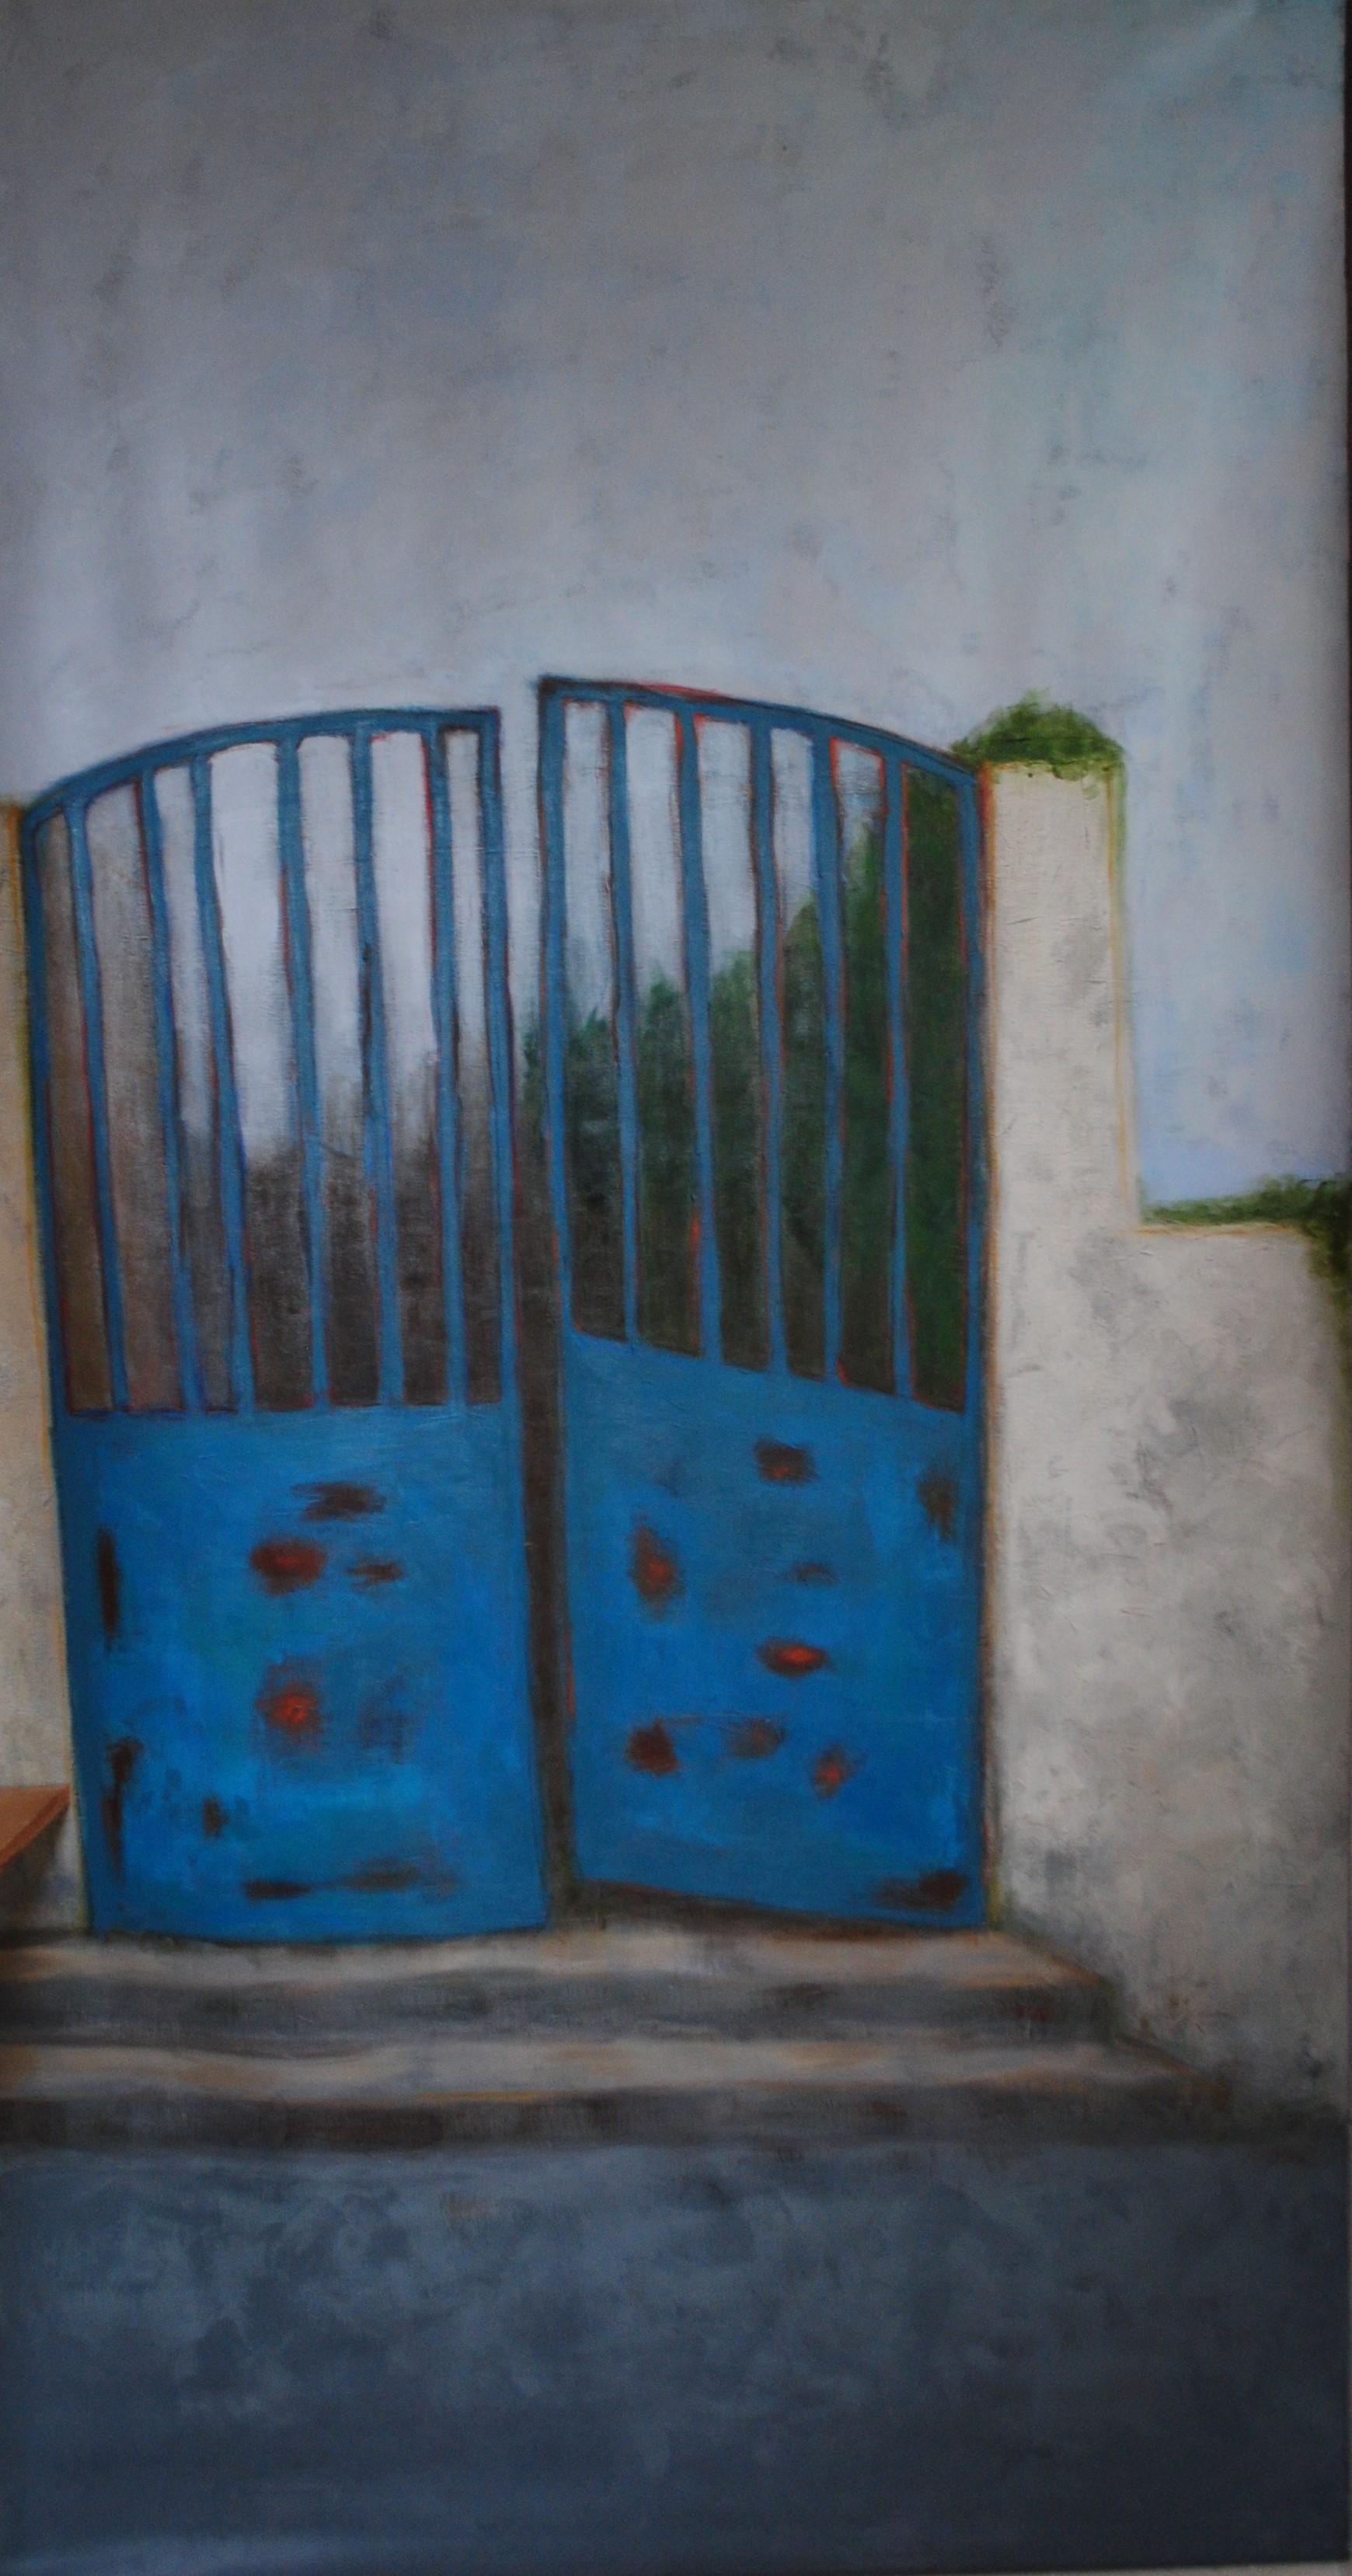 Portail, 230x160